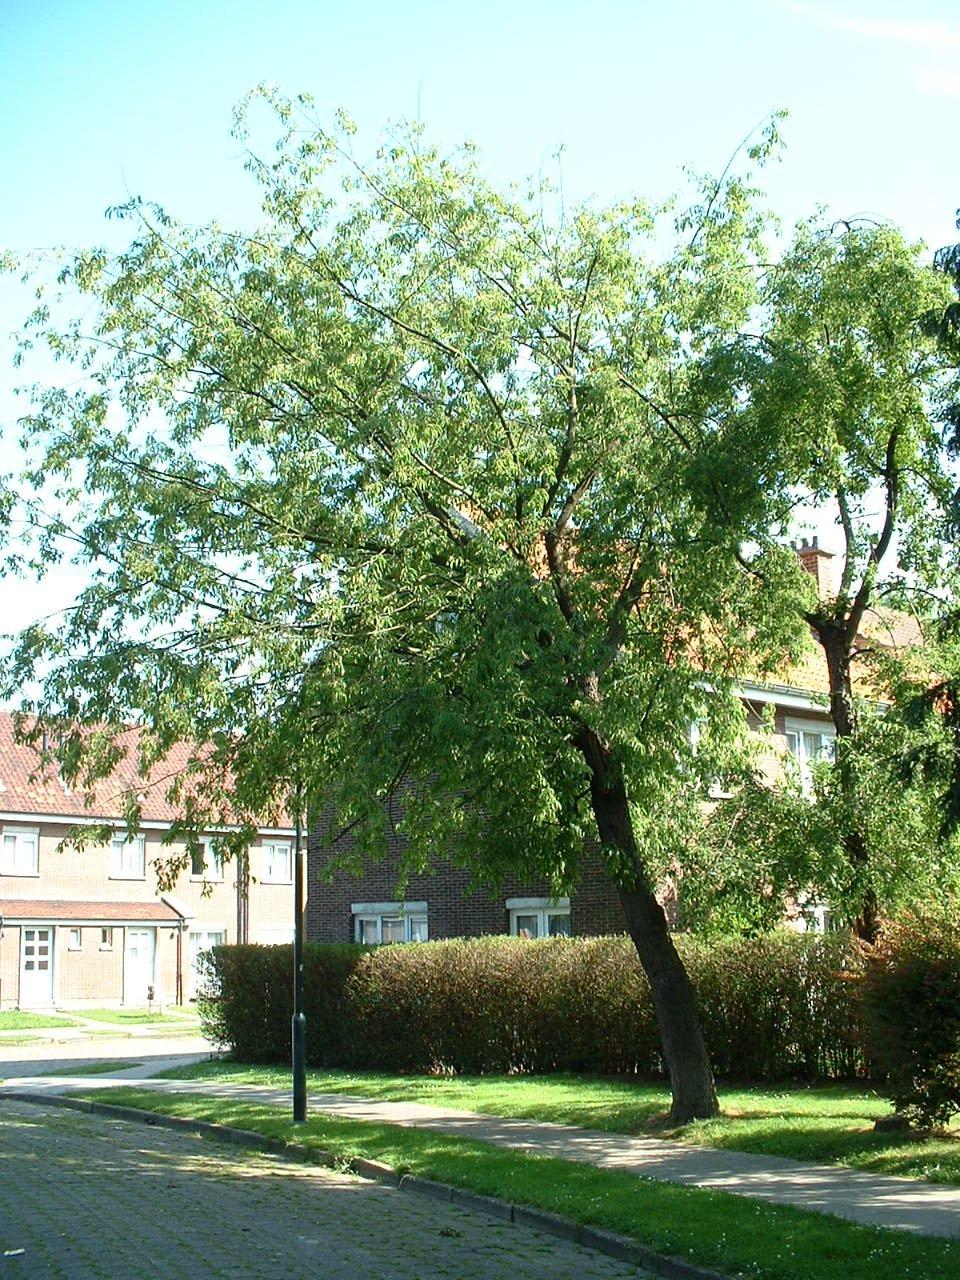 Cerisier noir – Evere, Quartier Tornooiveld, Avenue du Tornooiveld –  17 Juin 2002